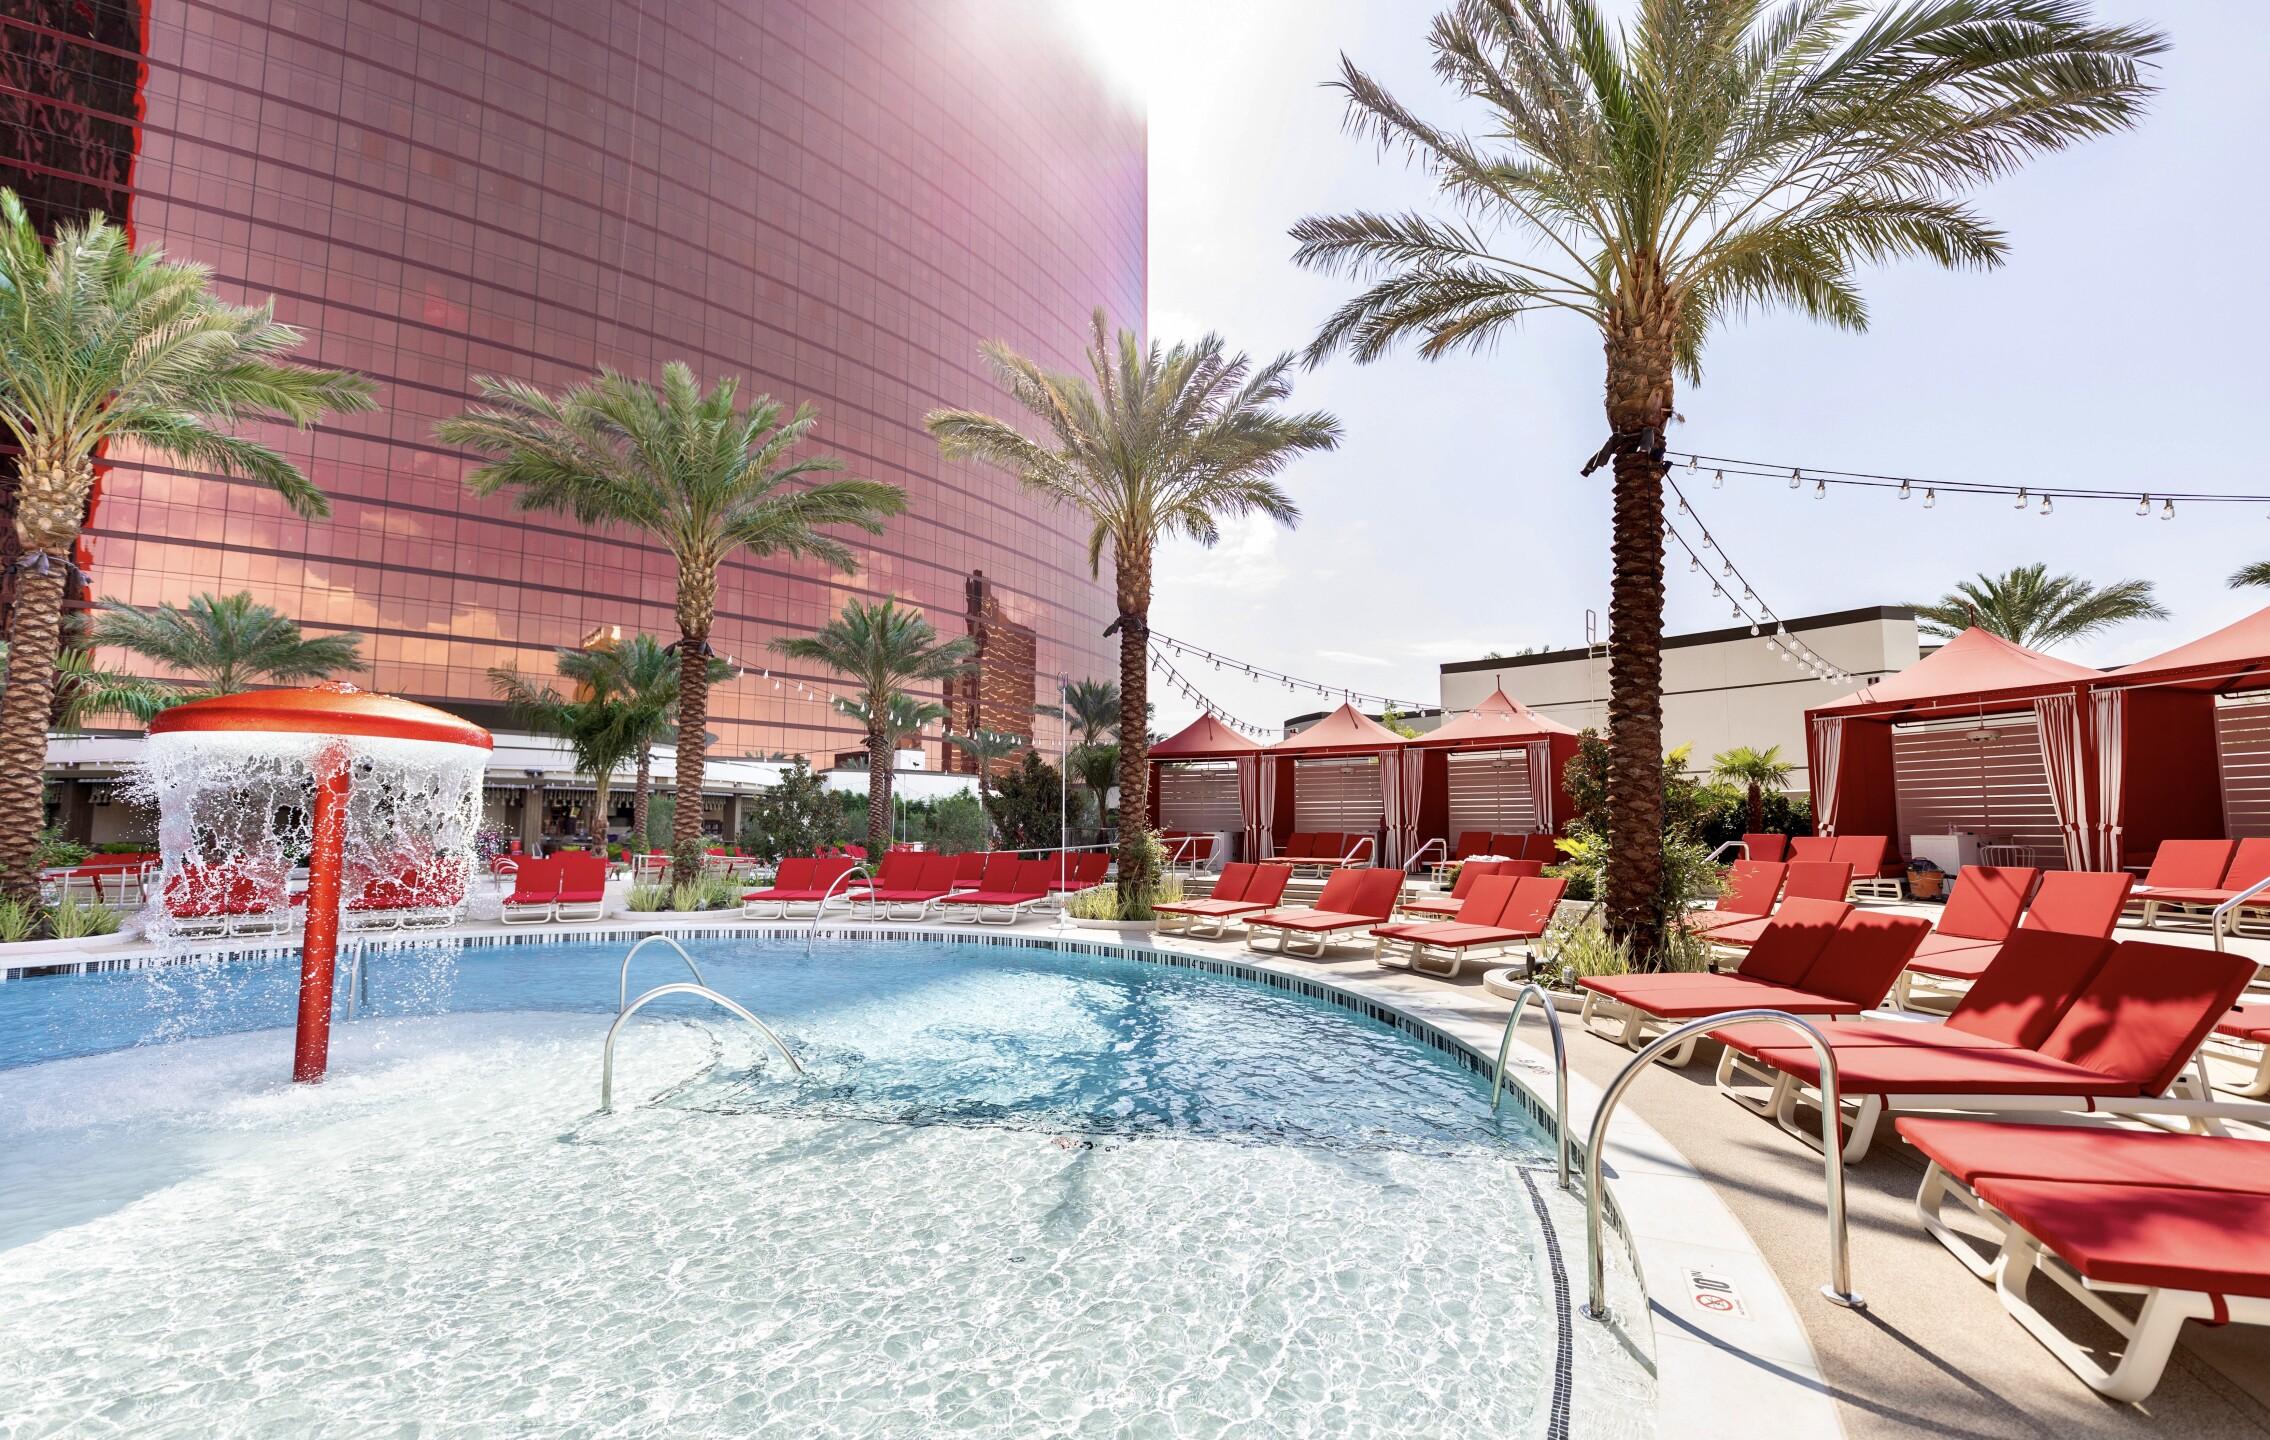 Resorts World Las Vegas - Cabana Pool - Credit Megan Blair.jpg